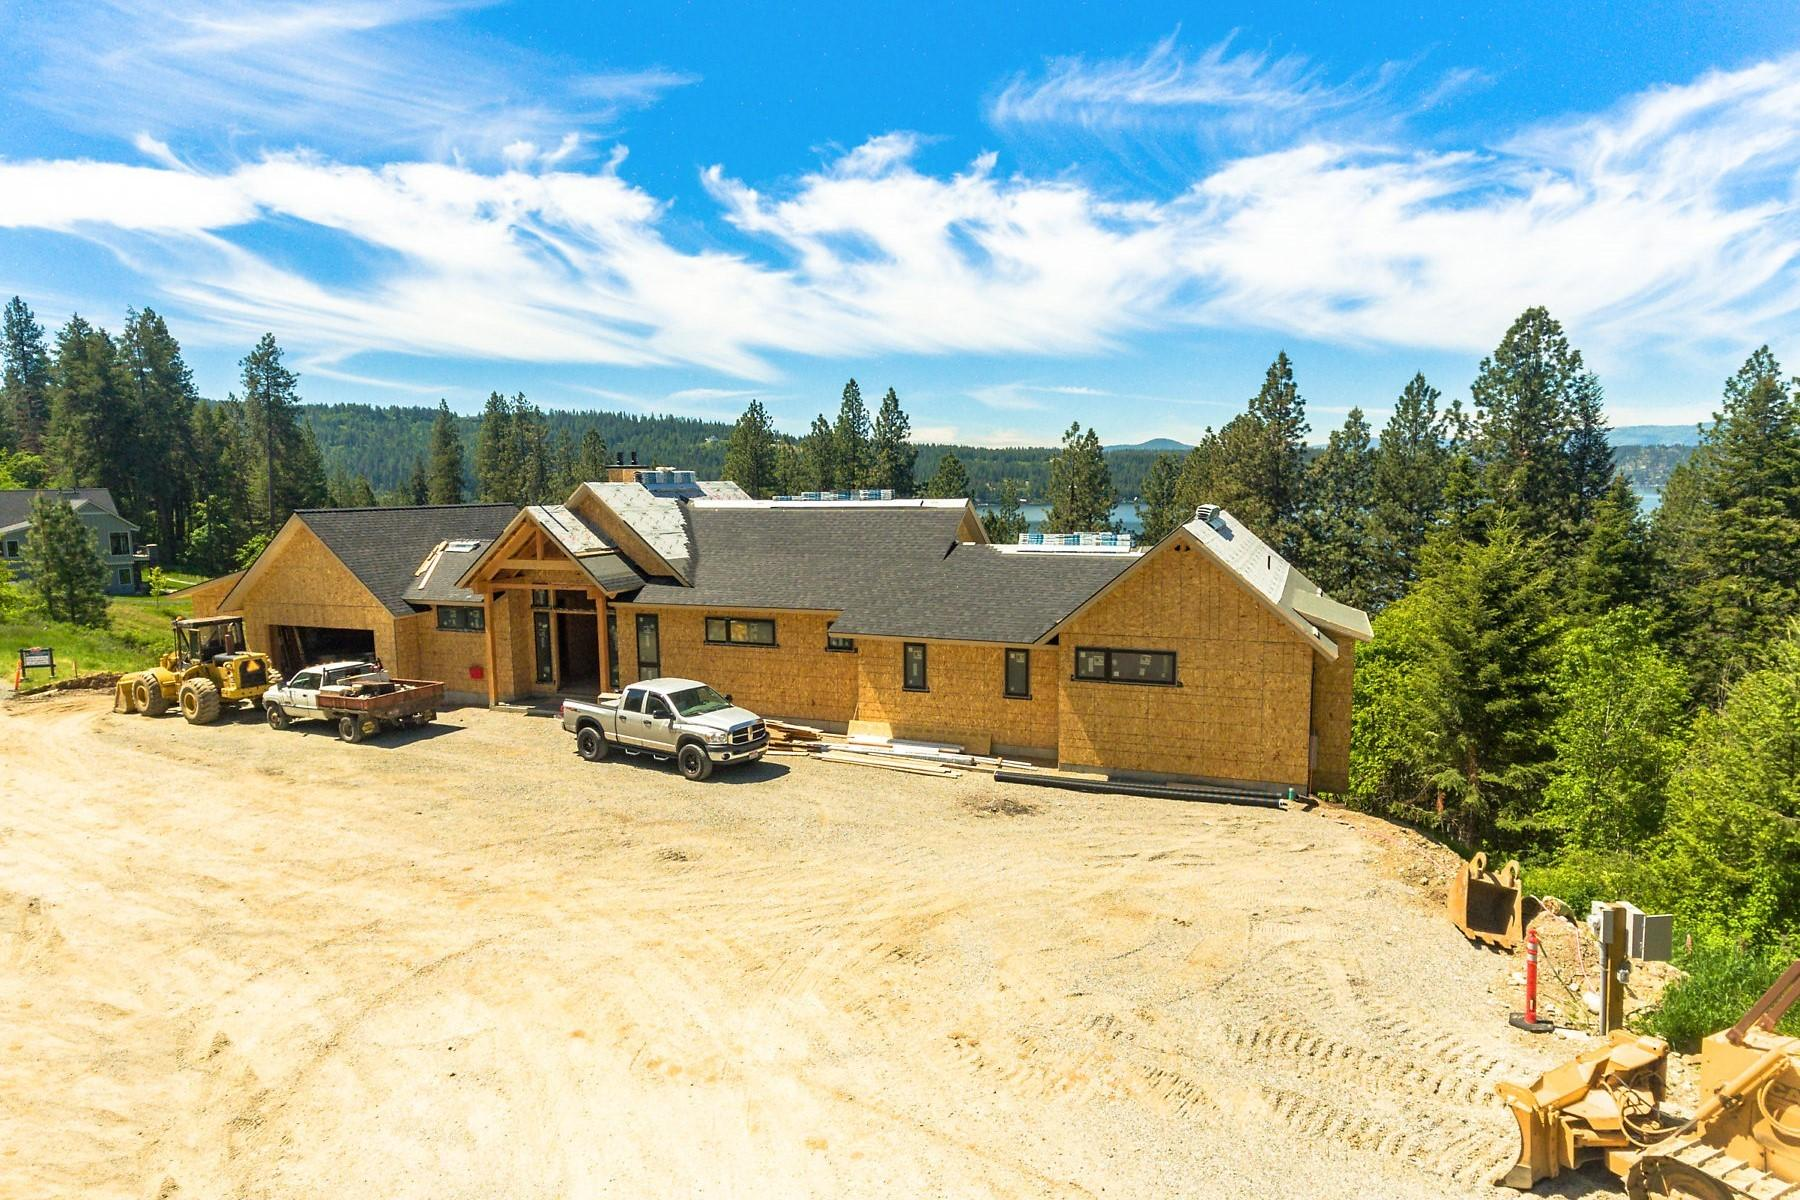 photo of 5572 E Yellowstone Trail  Coeur d'Alene Idaho 83814